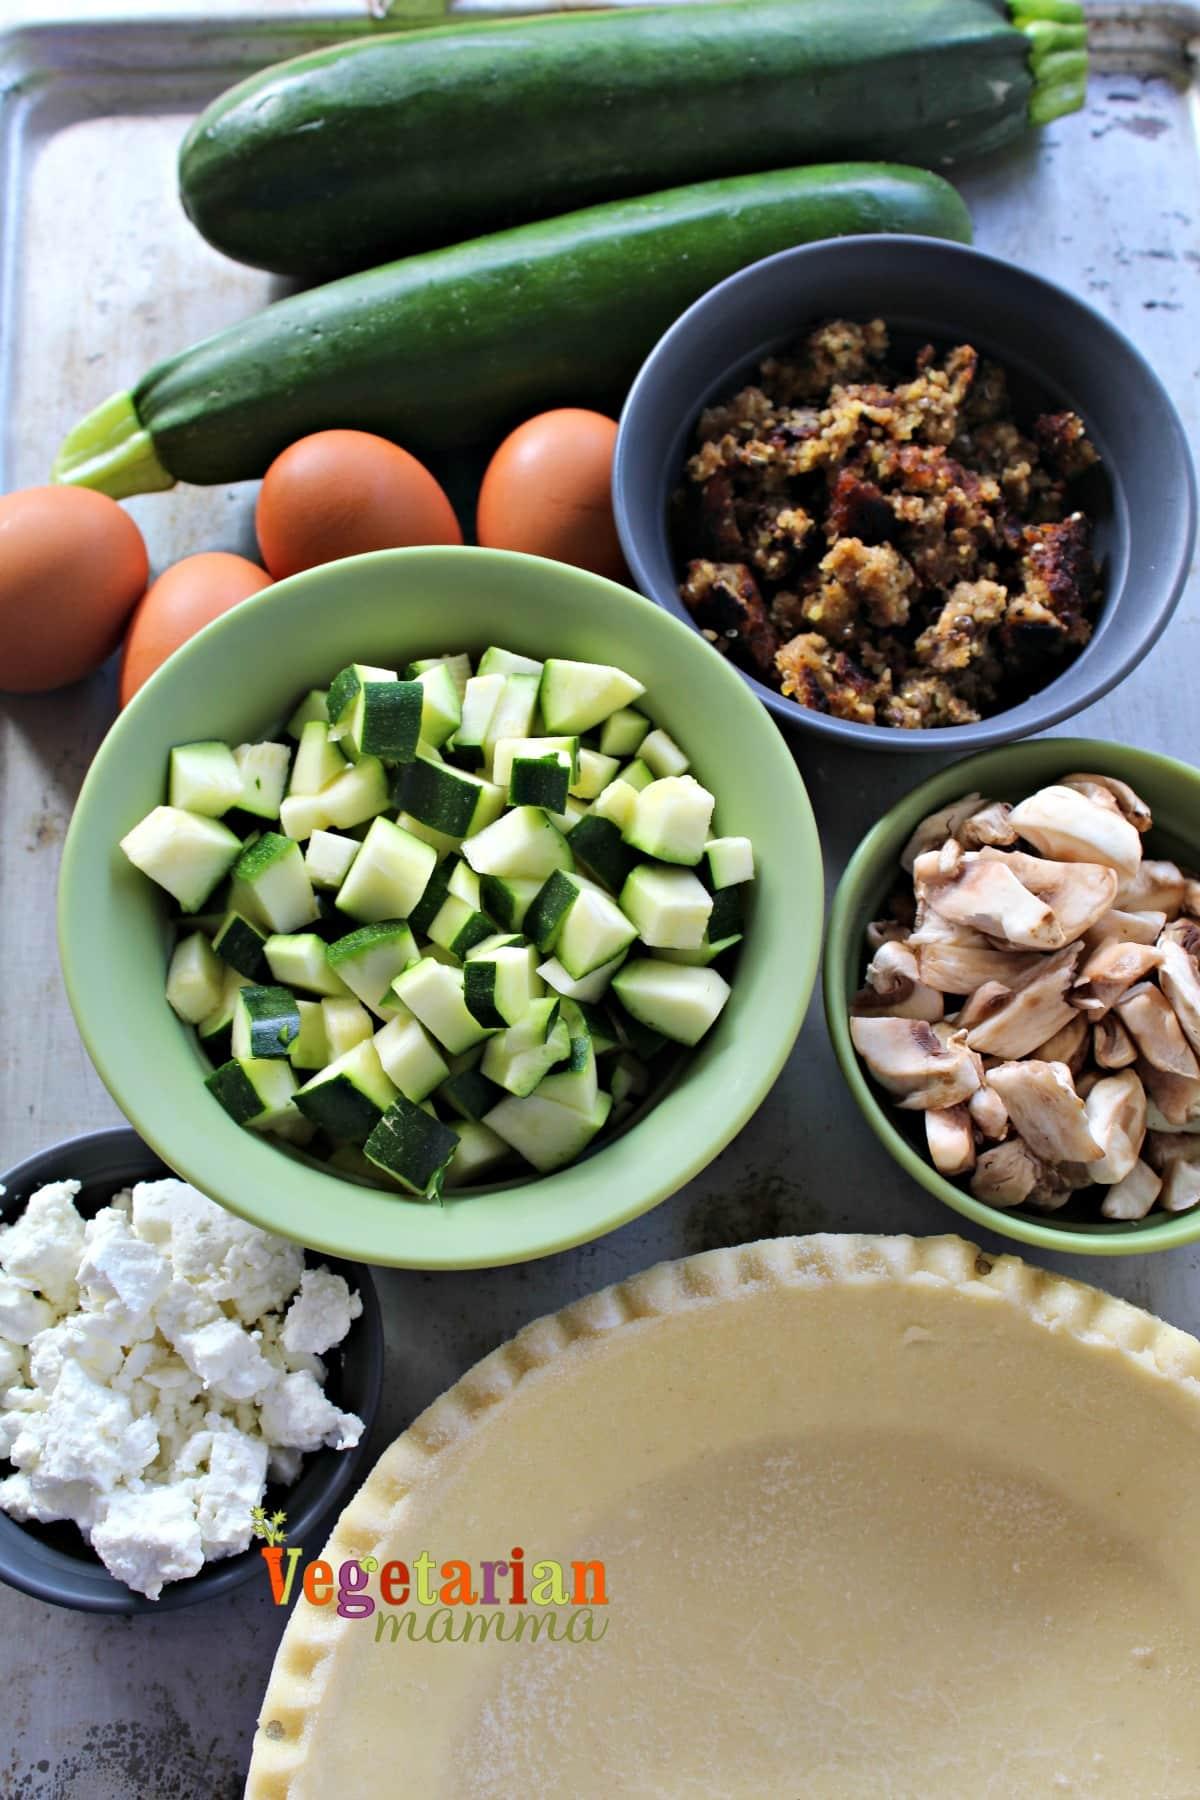 Gluten Free Quiche Recipes Gluten Free + Vegetarian Zucchini Quiche